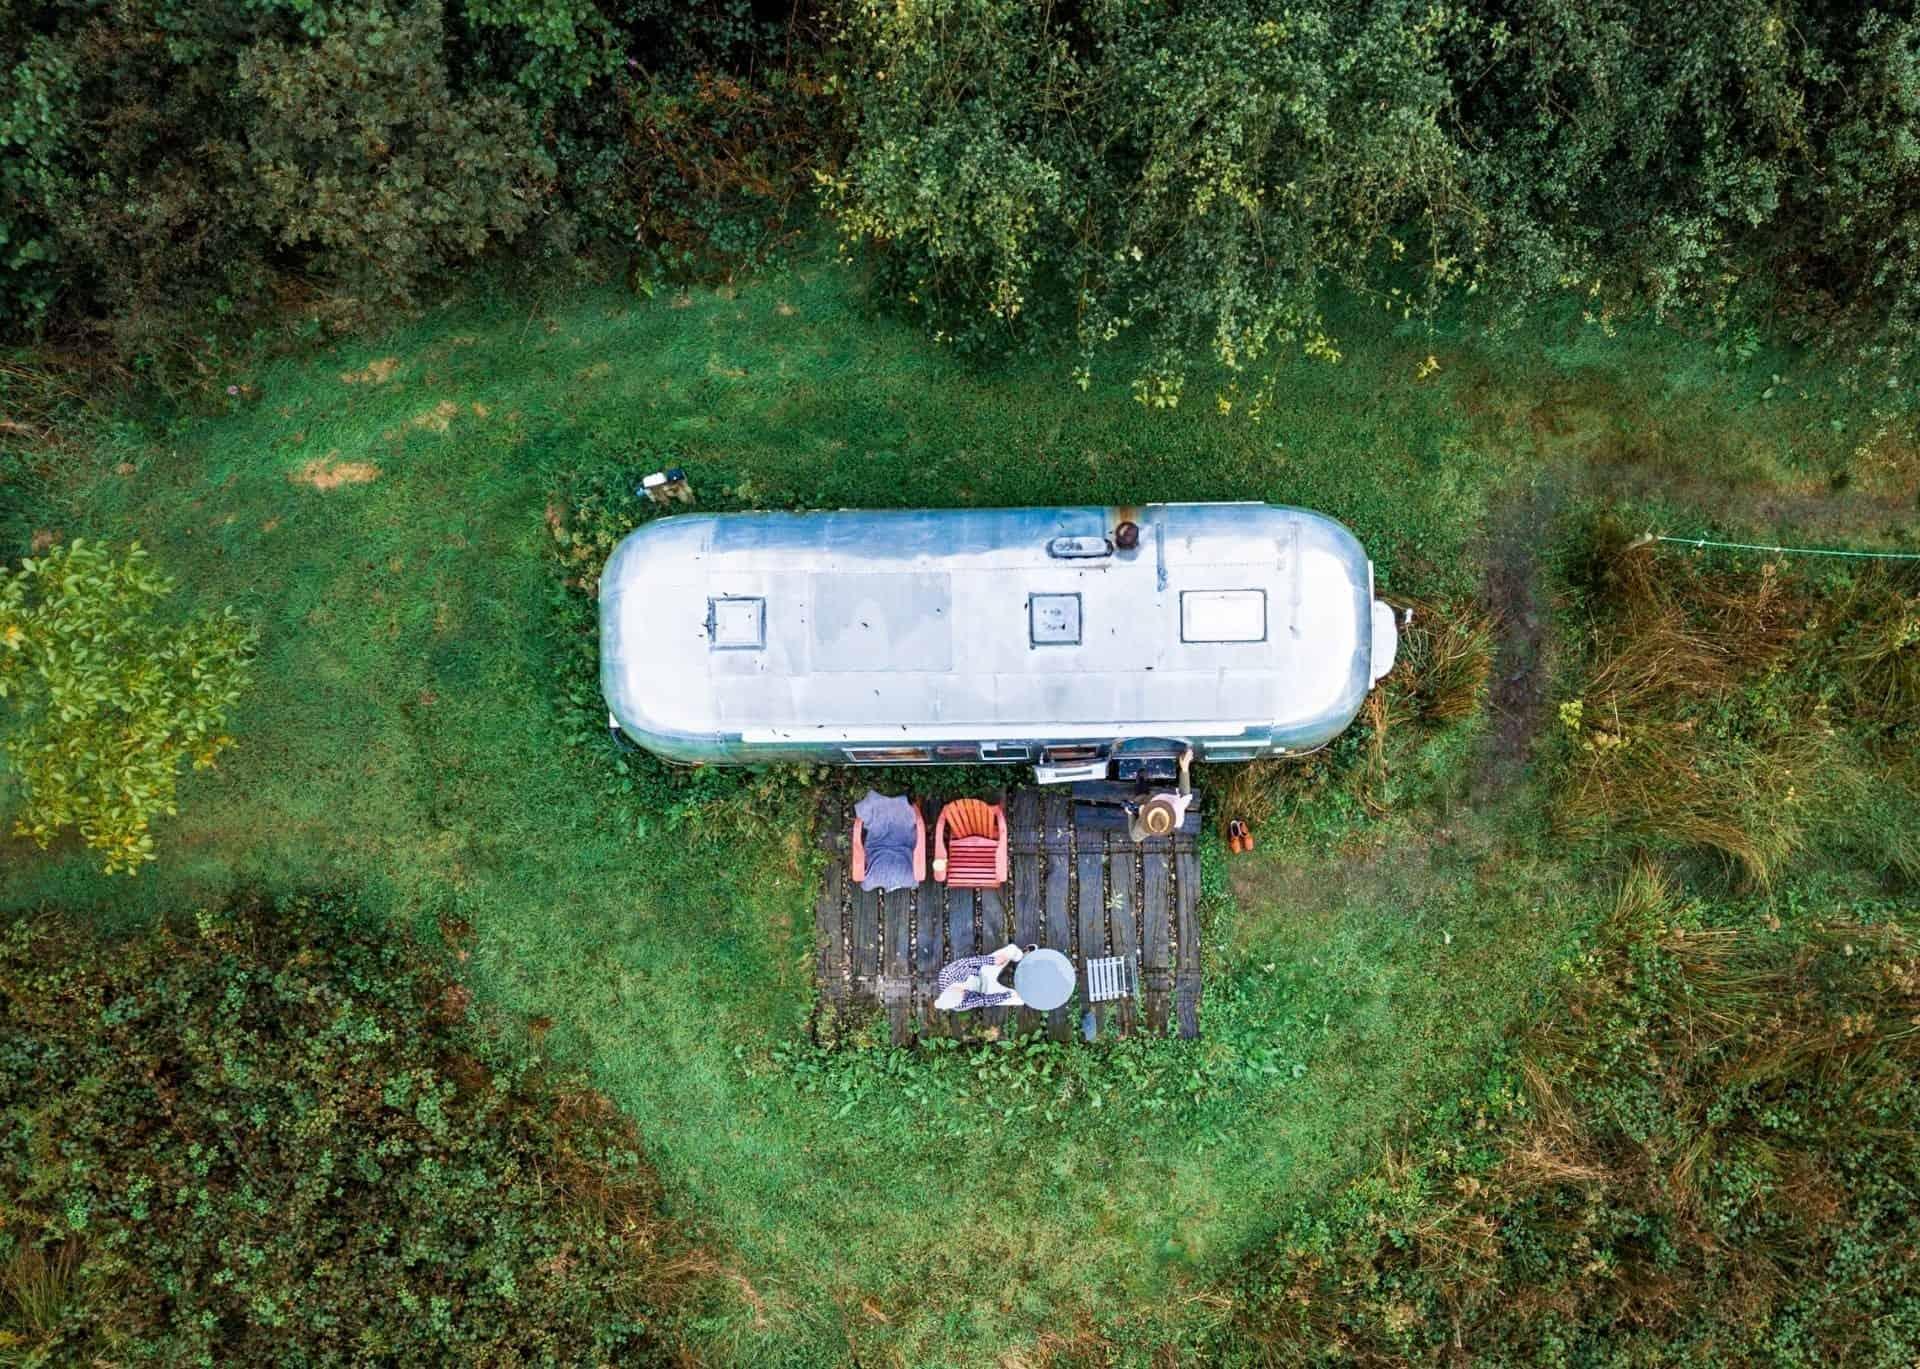 Wales' caravan parks